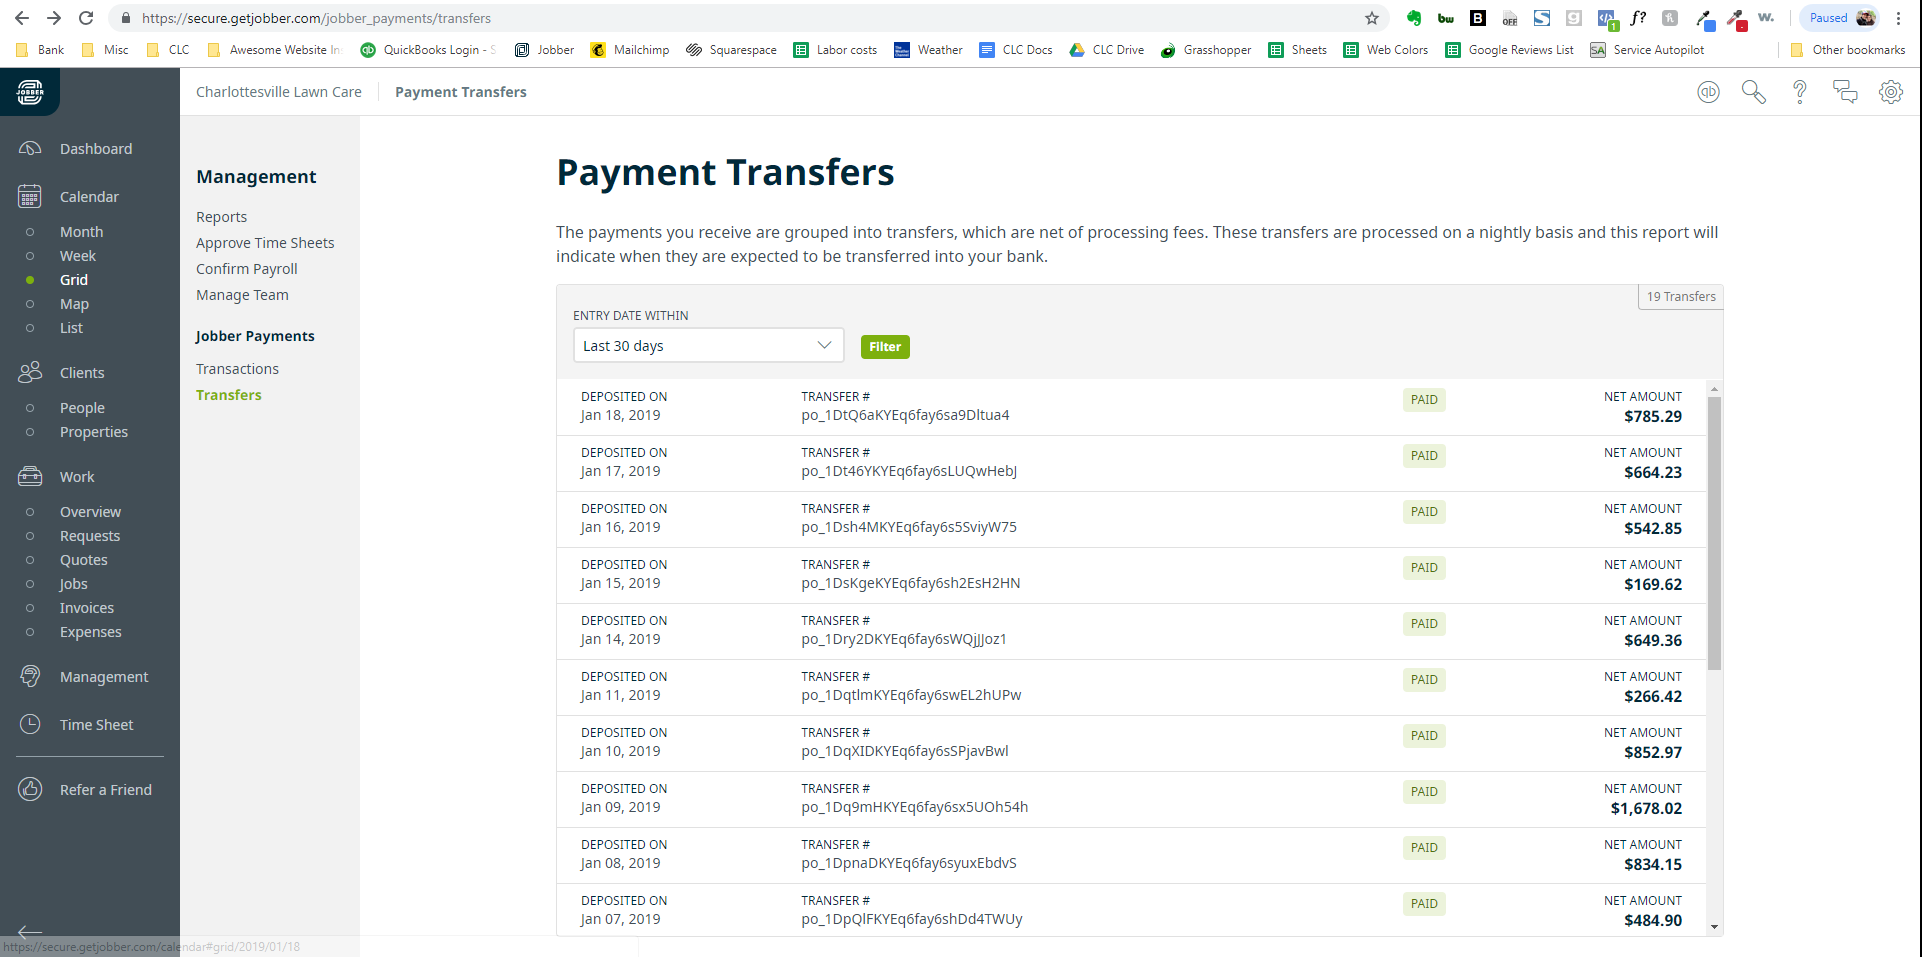 Jobber Payments Transfers: Jobber batch deposits shown here.